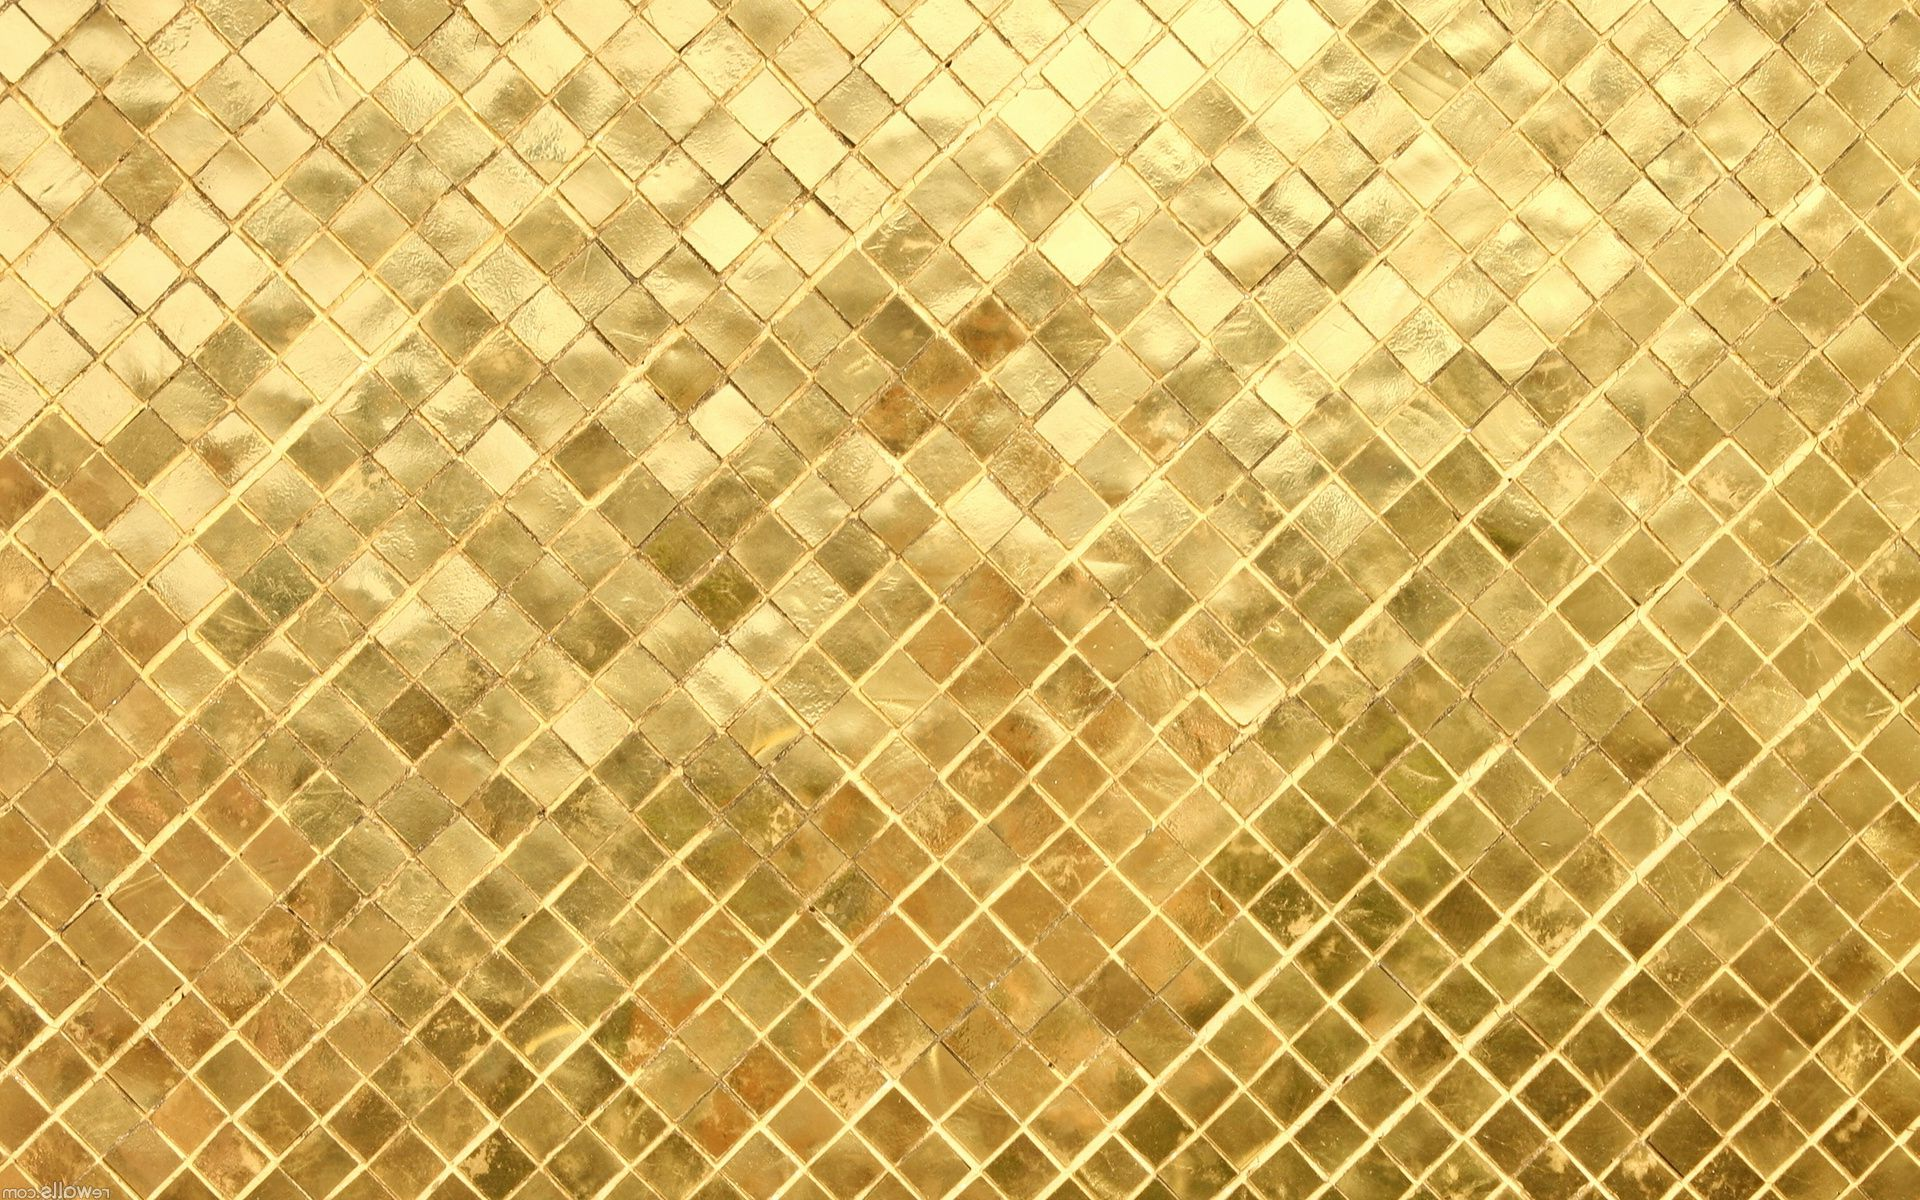 Gold Texture HD Wallpaper On Secret Hunt Gold